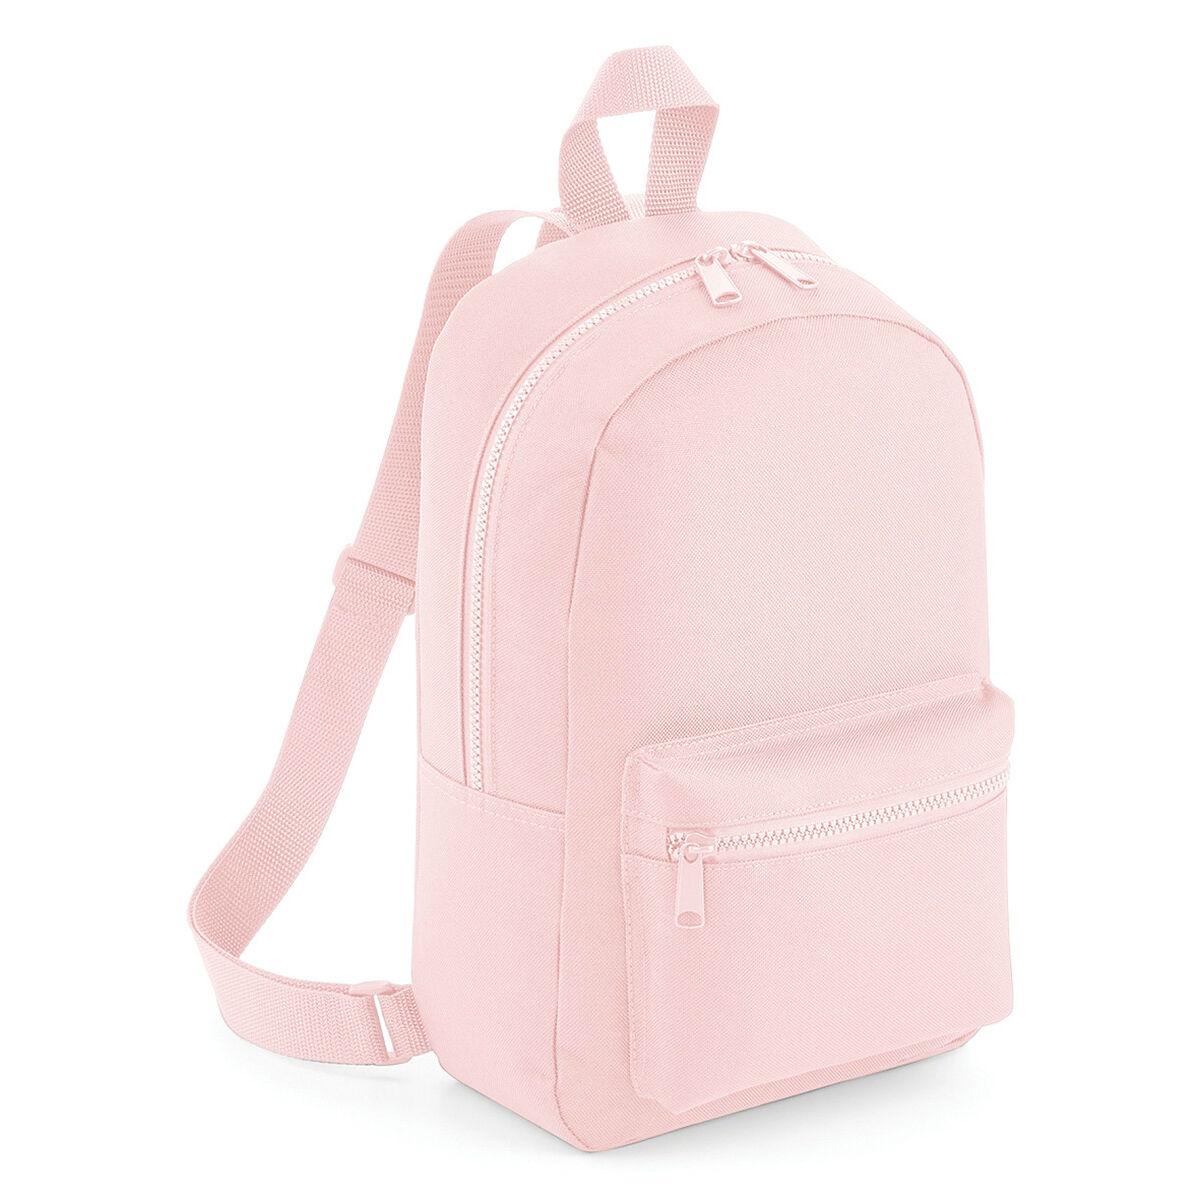 Basebag Fashion Backpack (Powder Pink)